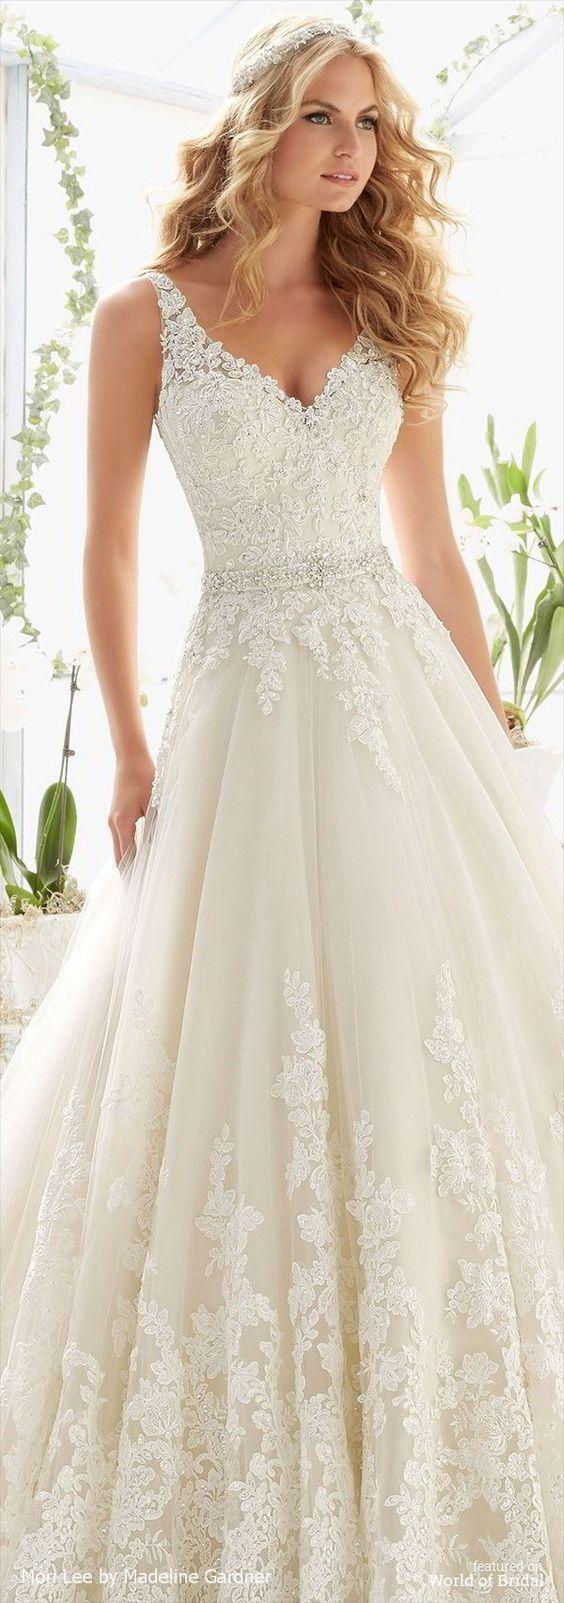 Bellas wedding dress  Mori Lee by Madeline Gardner Spring  Wedding Dresses  Scalloped